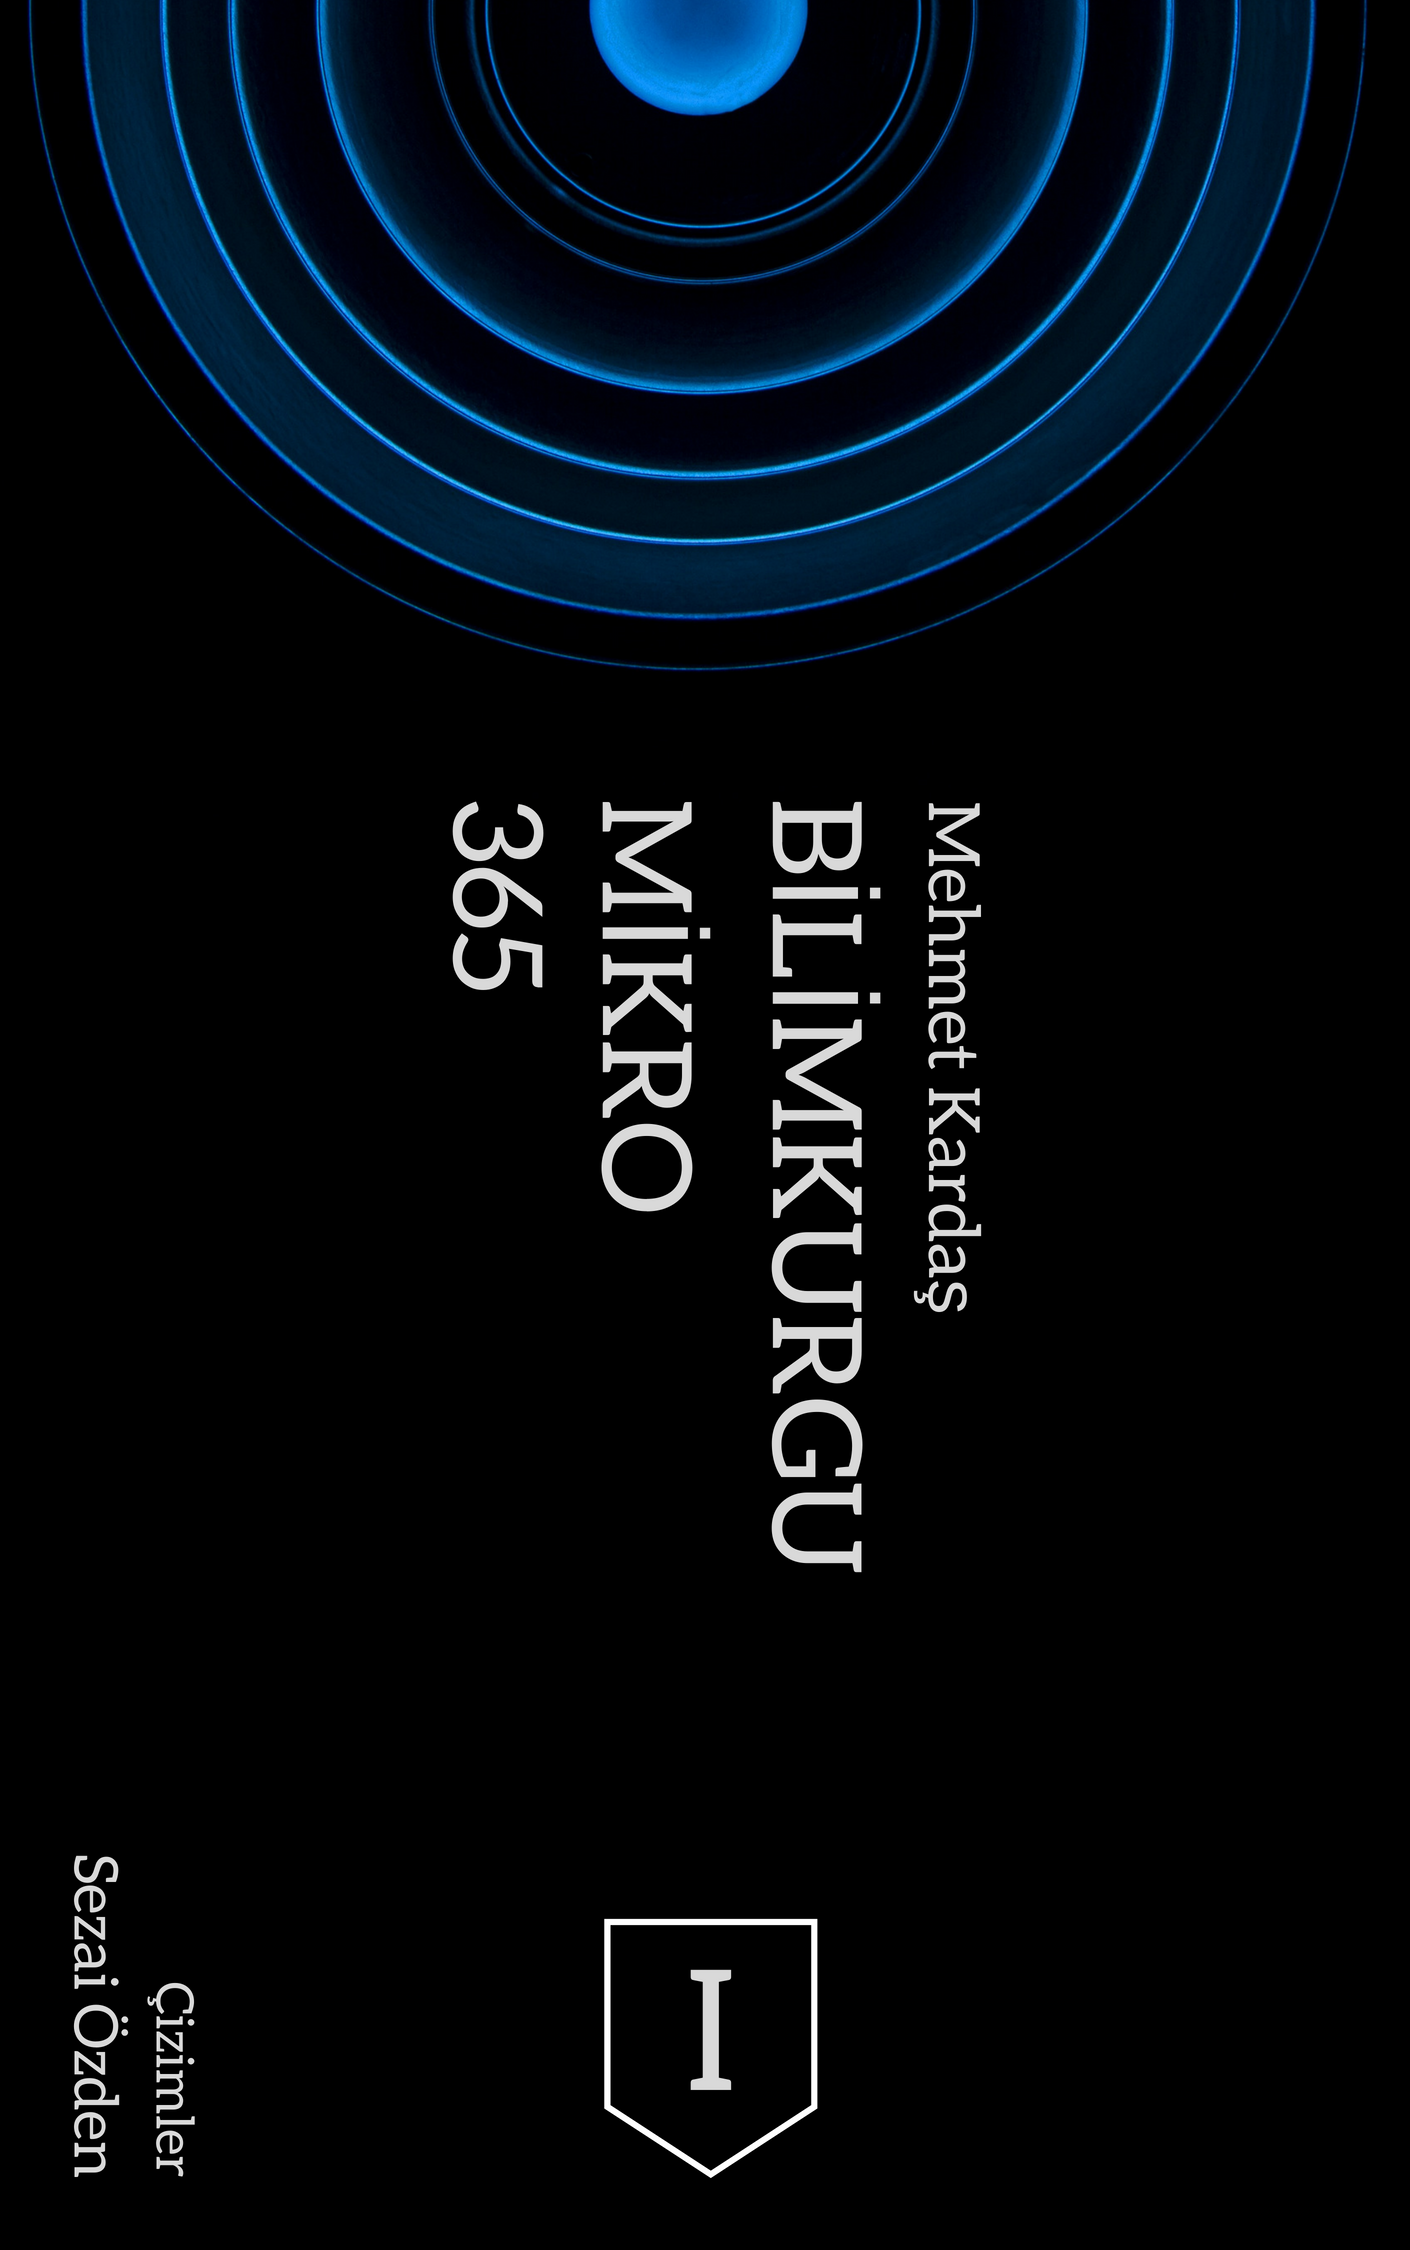 Smashwords 365 Mikro Bilimkurgu I A Book By Mehmet Kardaş